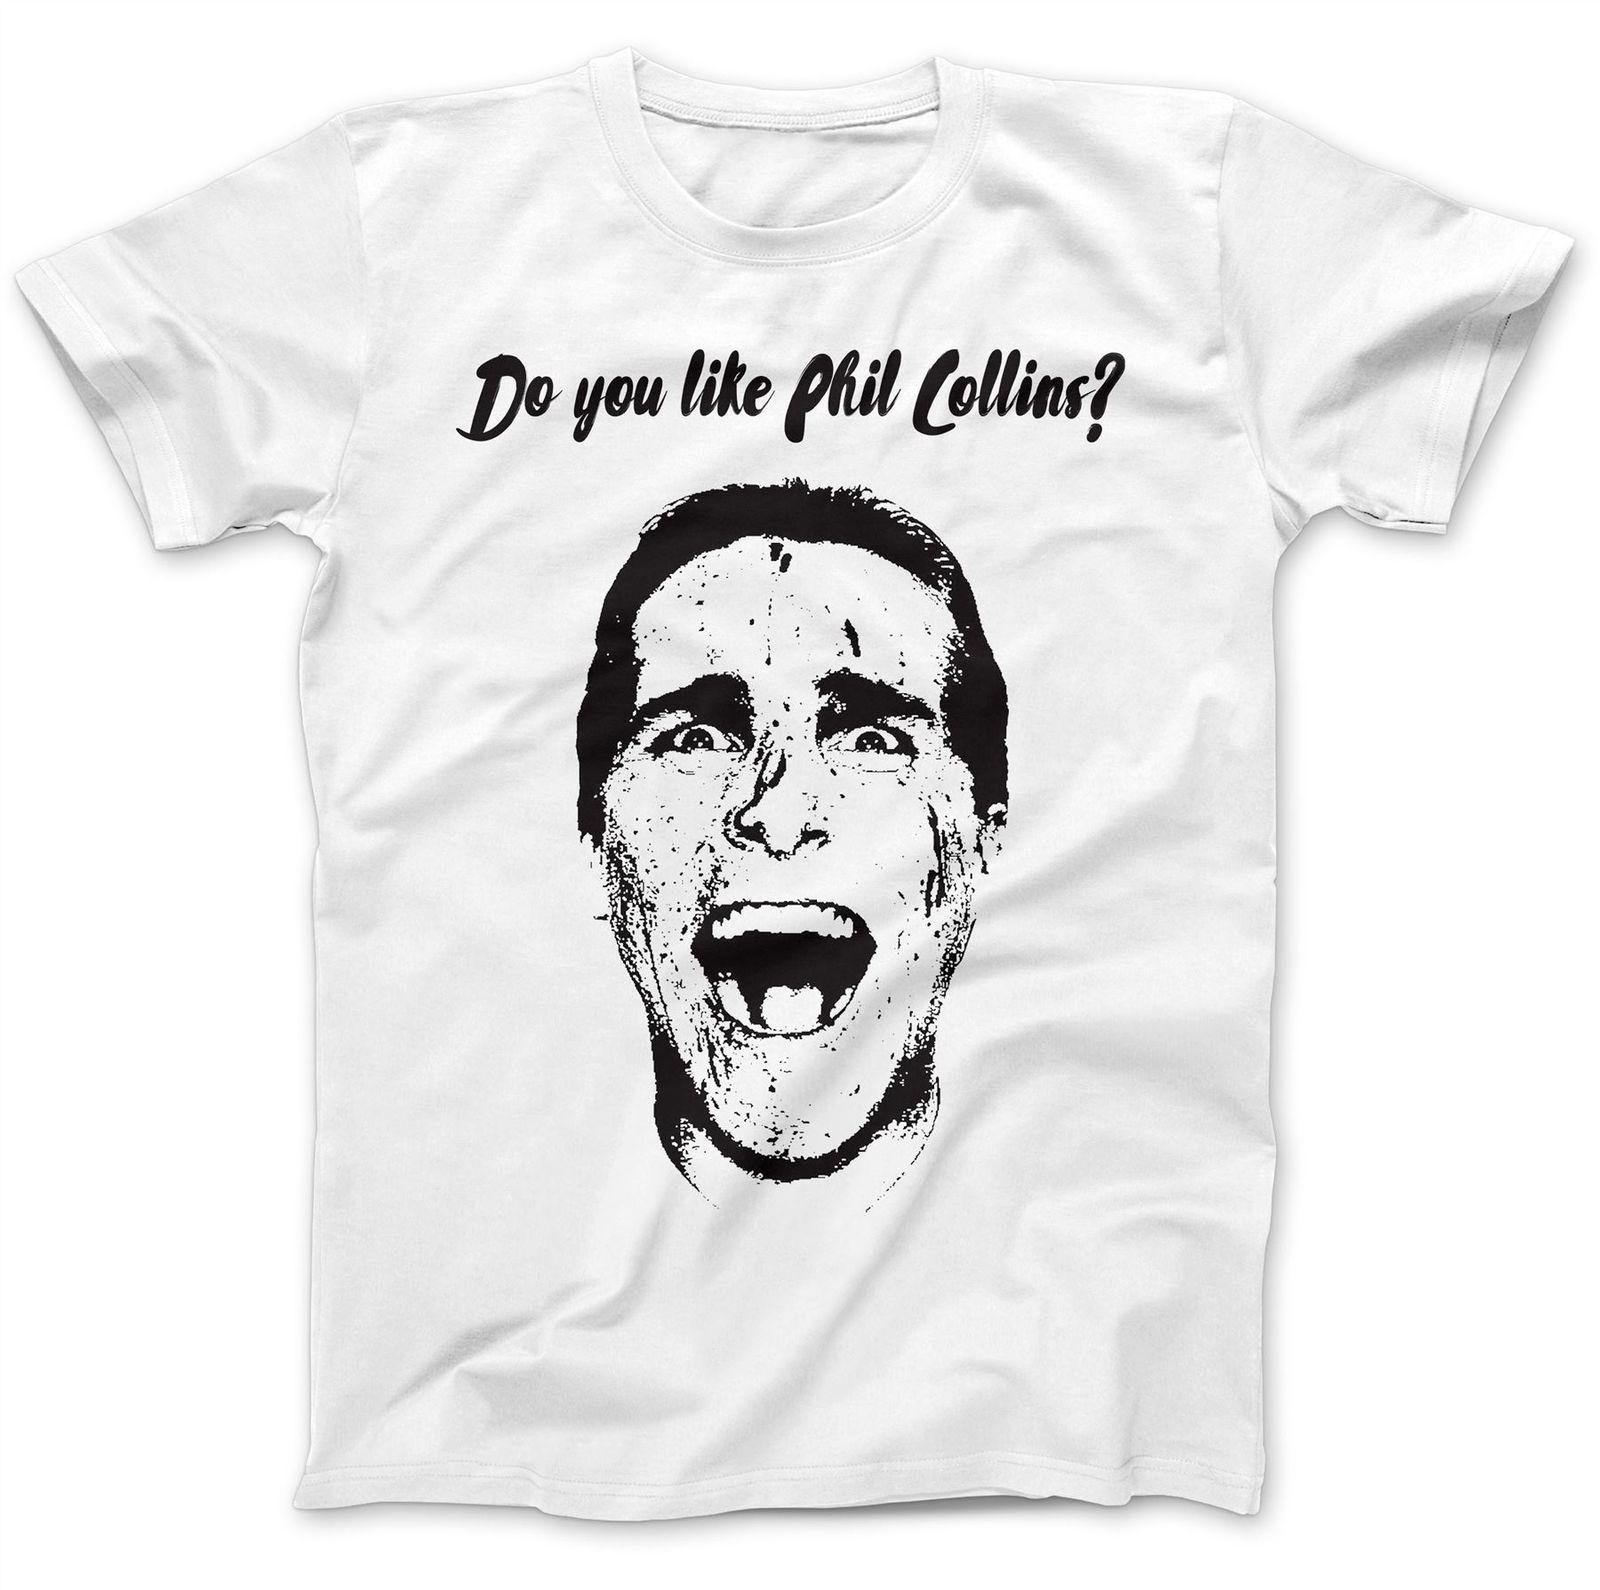 Christian Bale T-Shirt 100% Premium Cotton Comical Shirts MenS